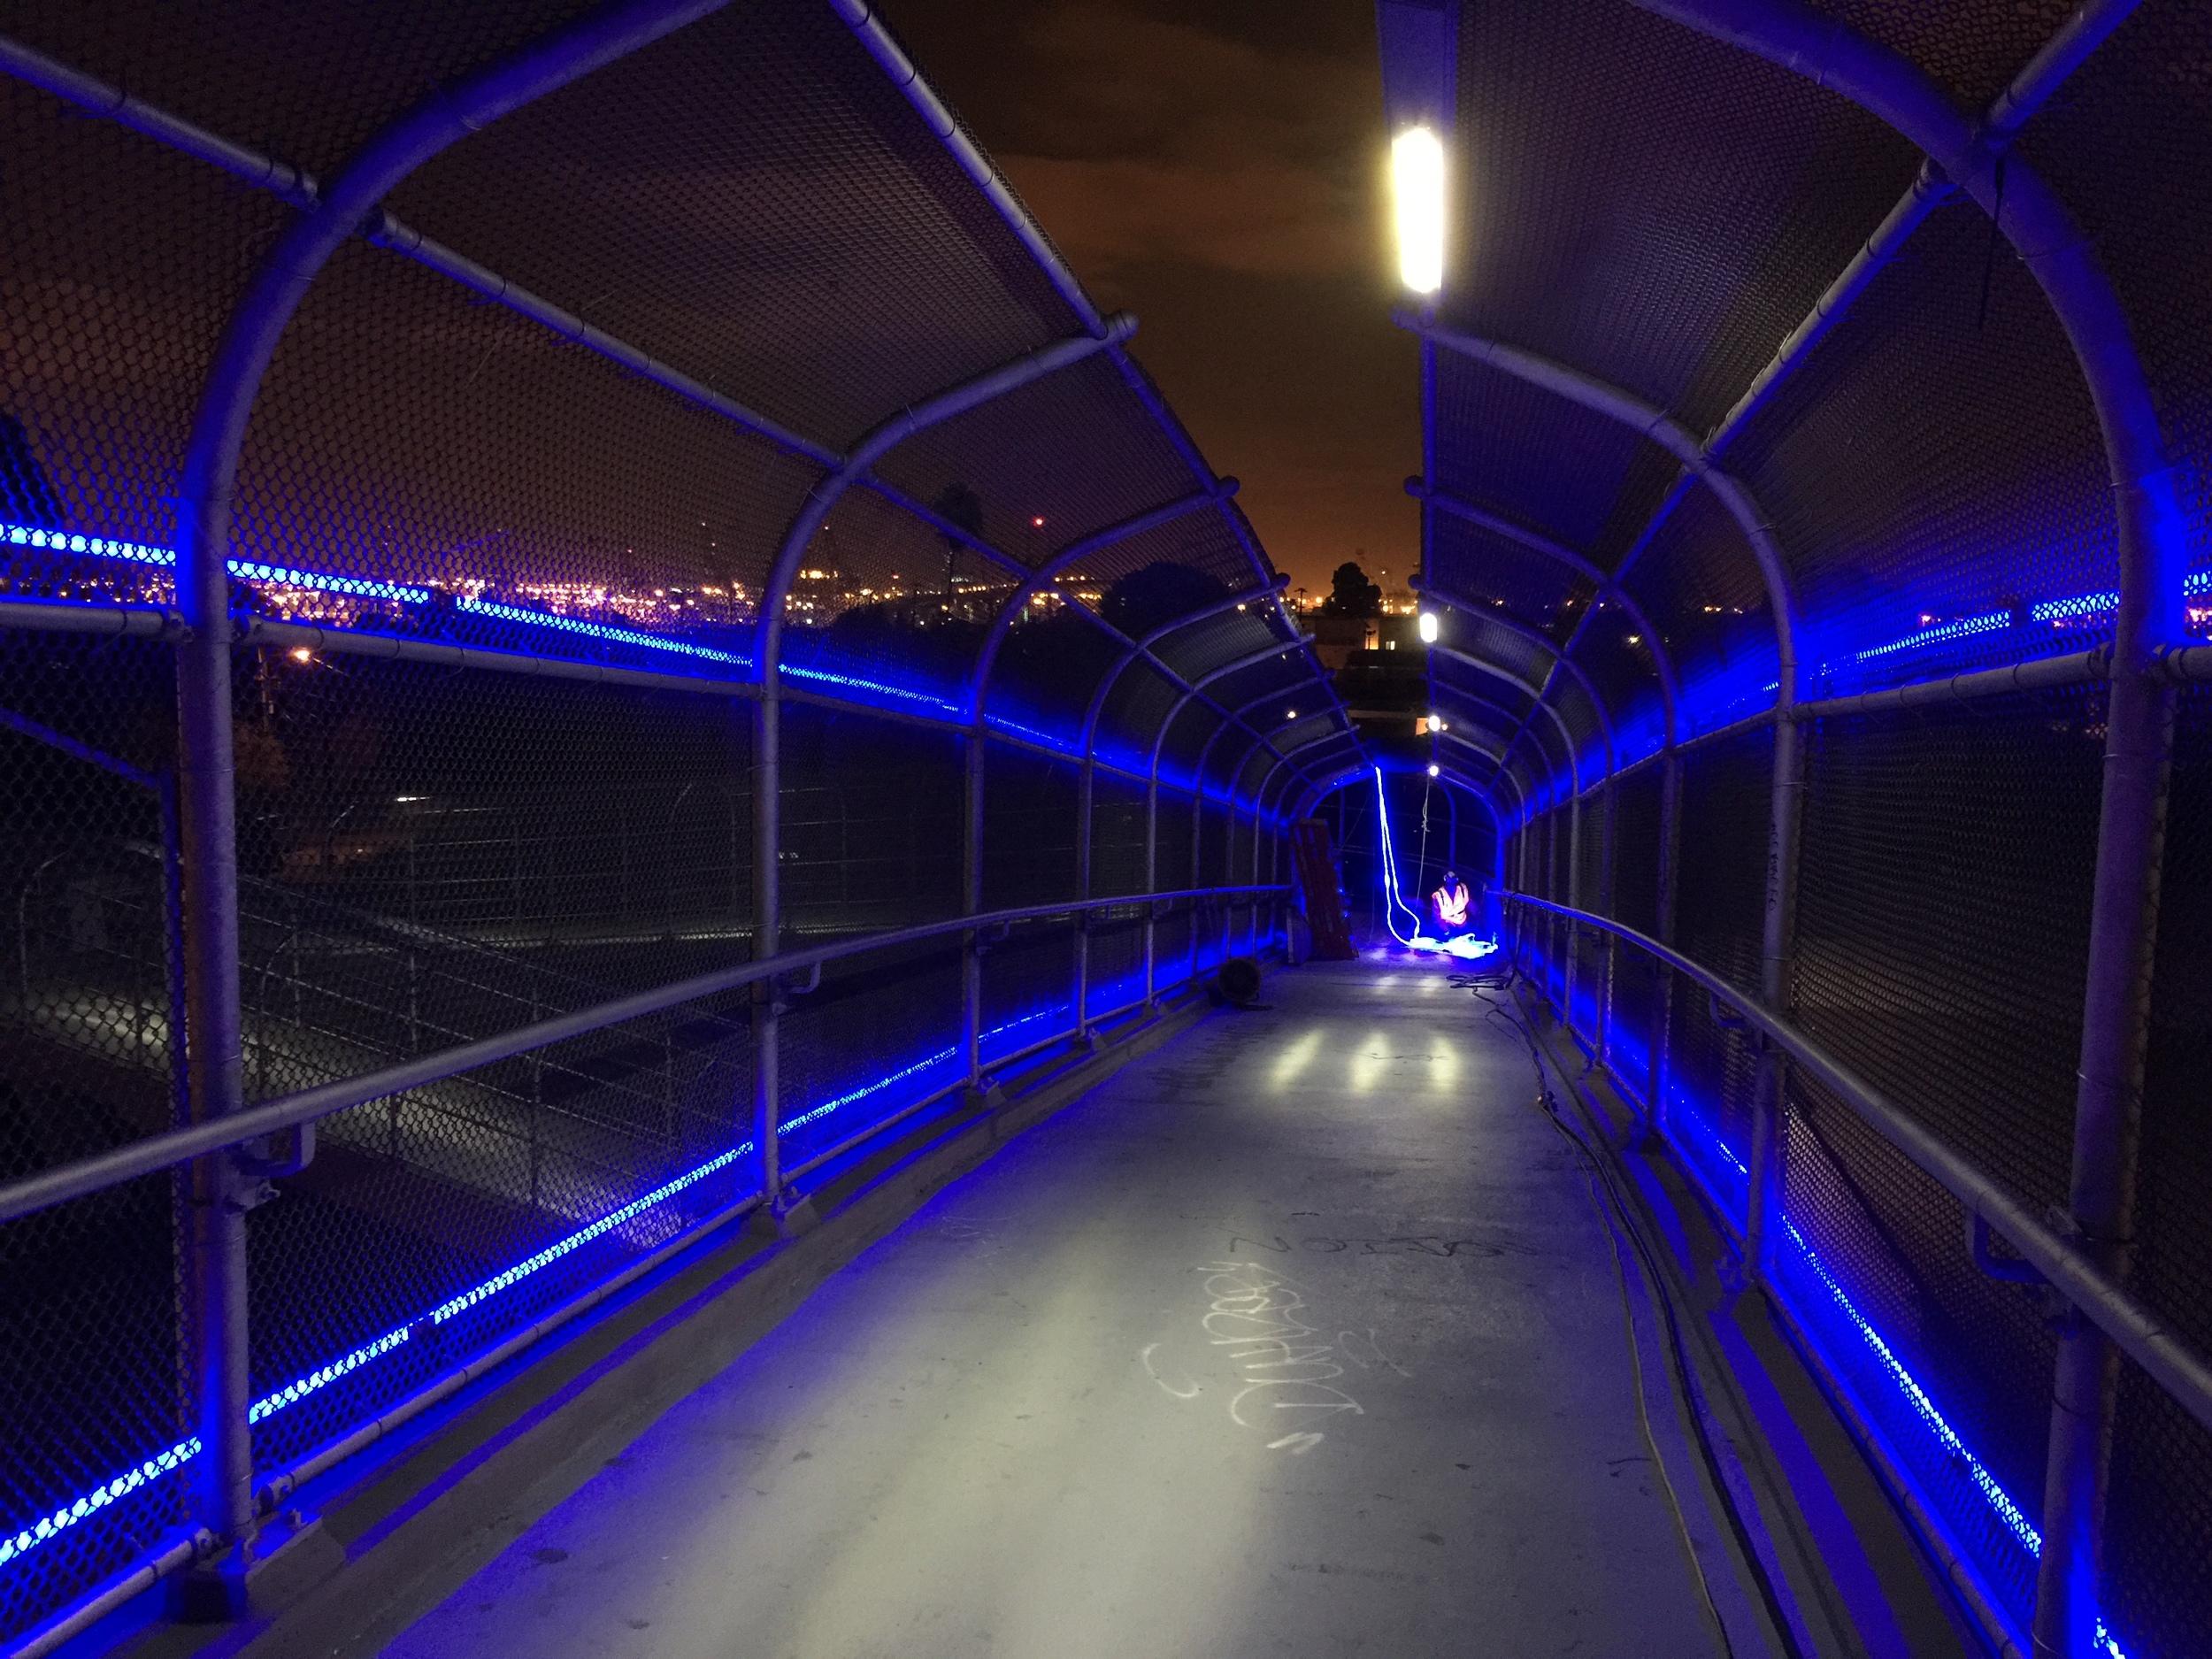 Gaffey Street Pedestrian Bridge Lighting 2014